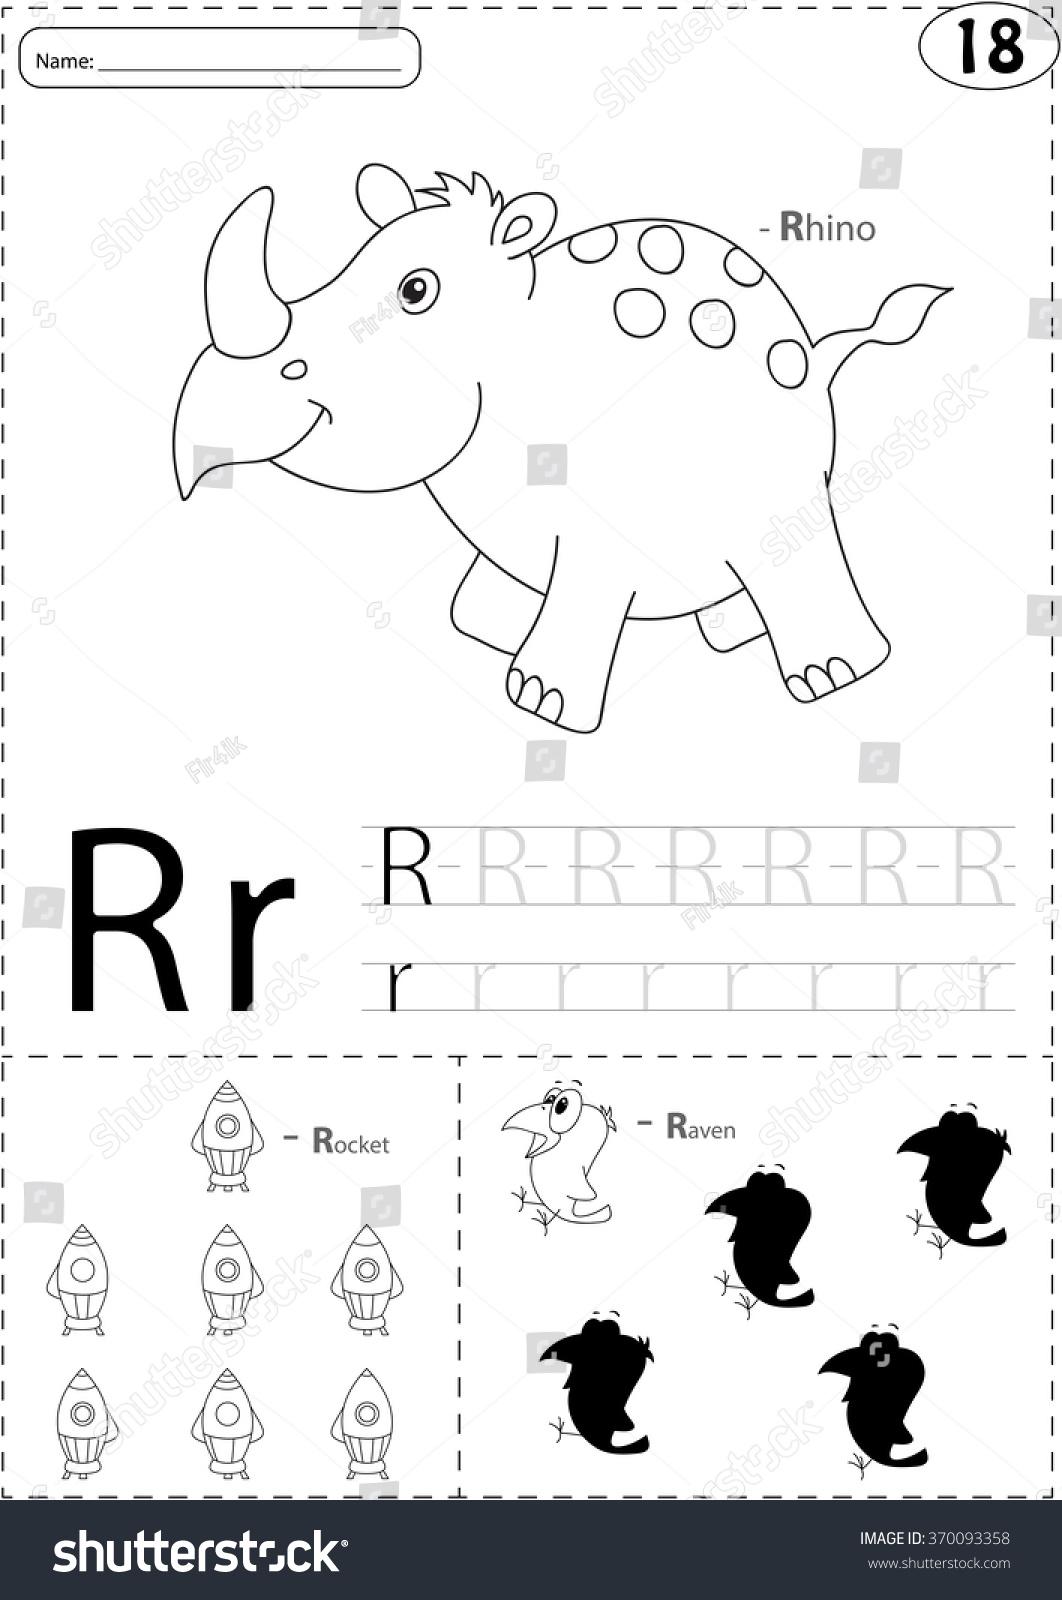 Cartoon Rhino Rocket Raven Alphabet Tracing Stock Vector